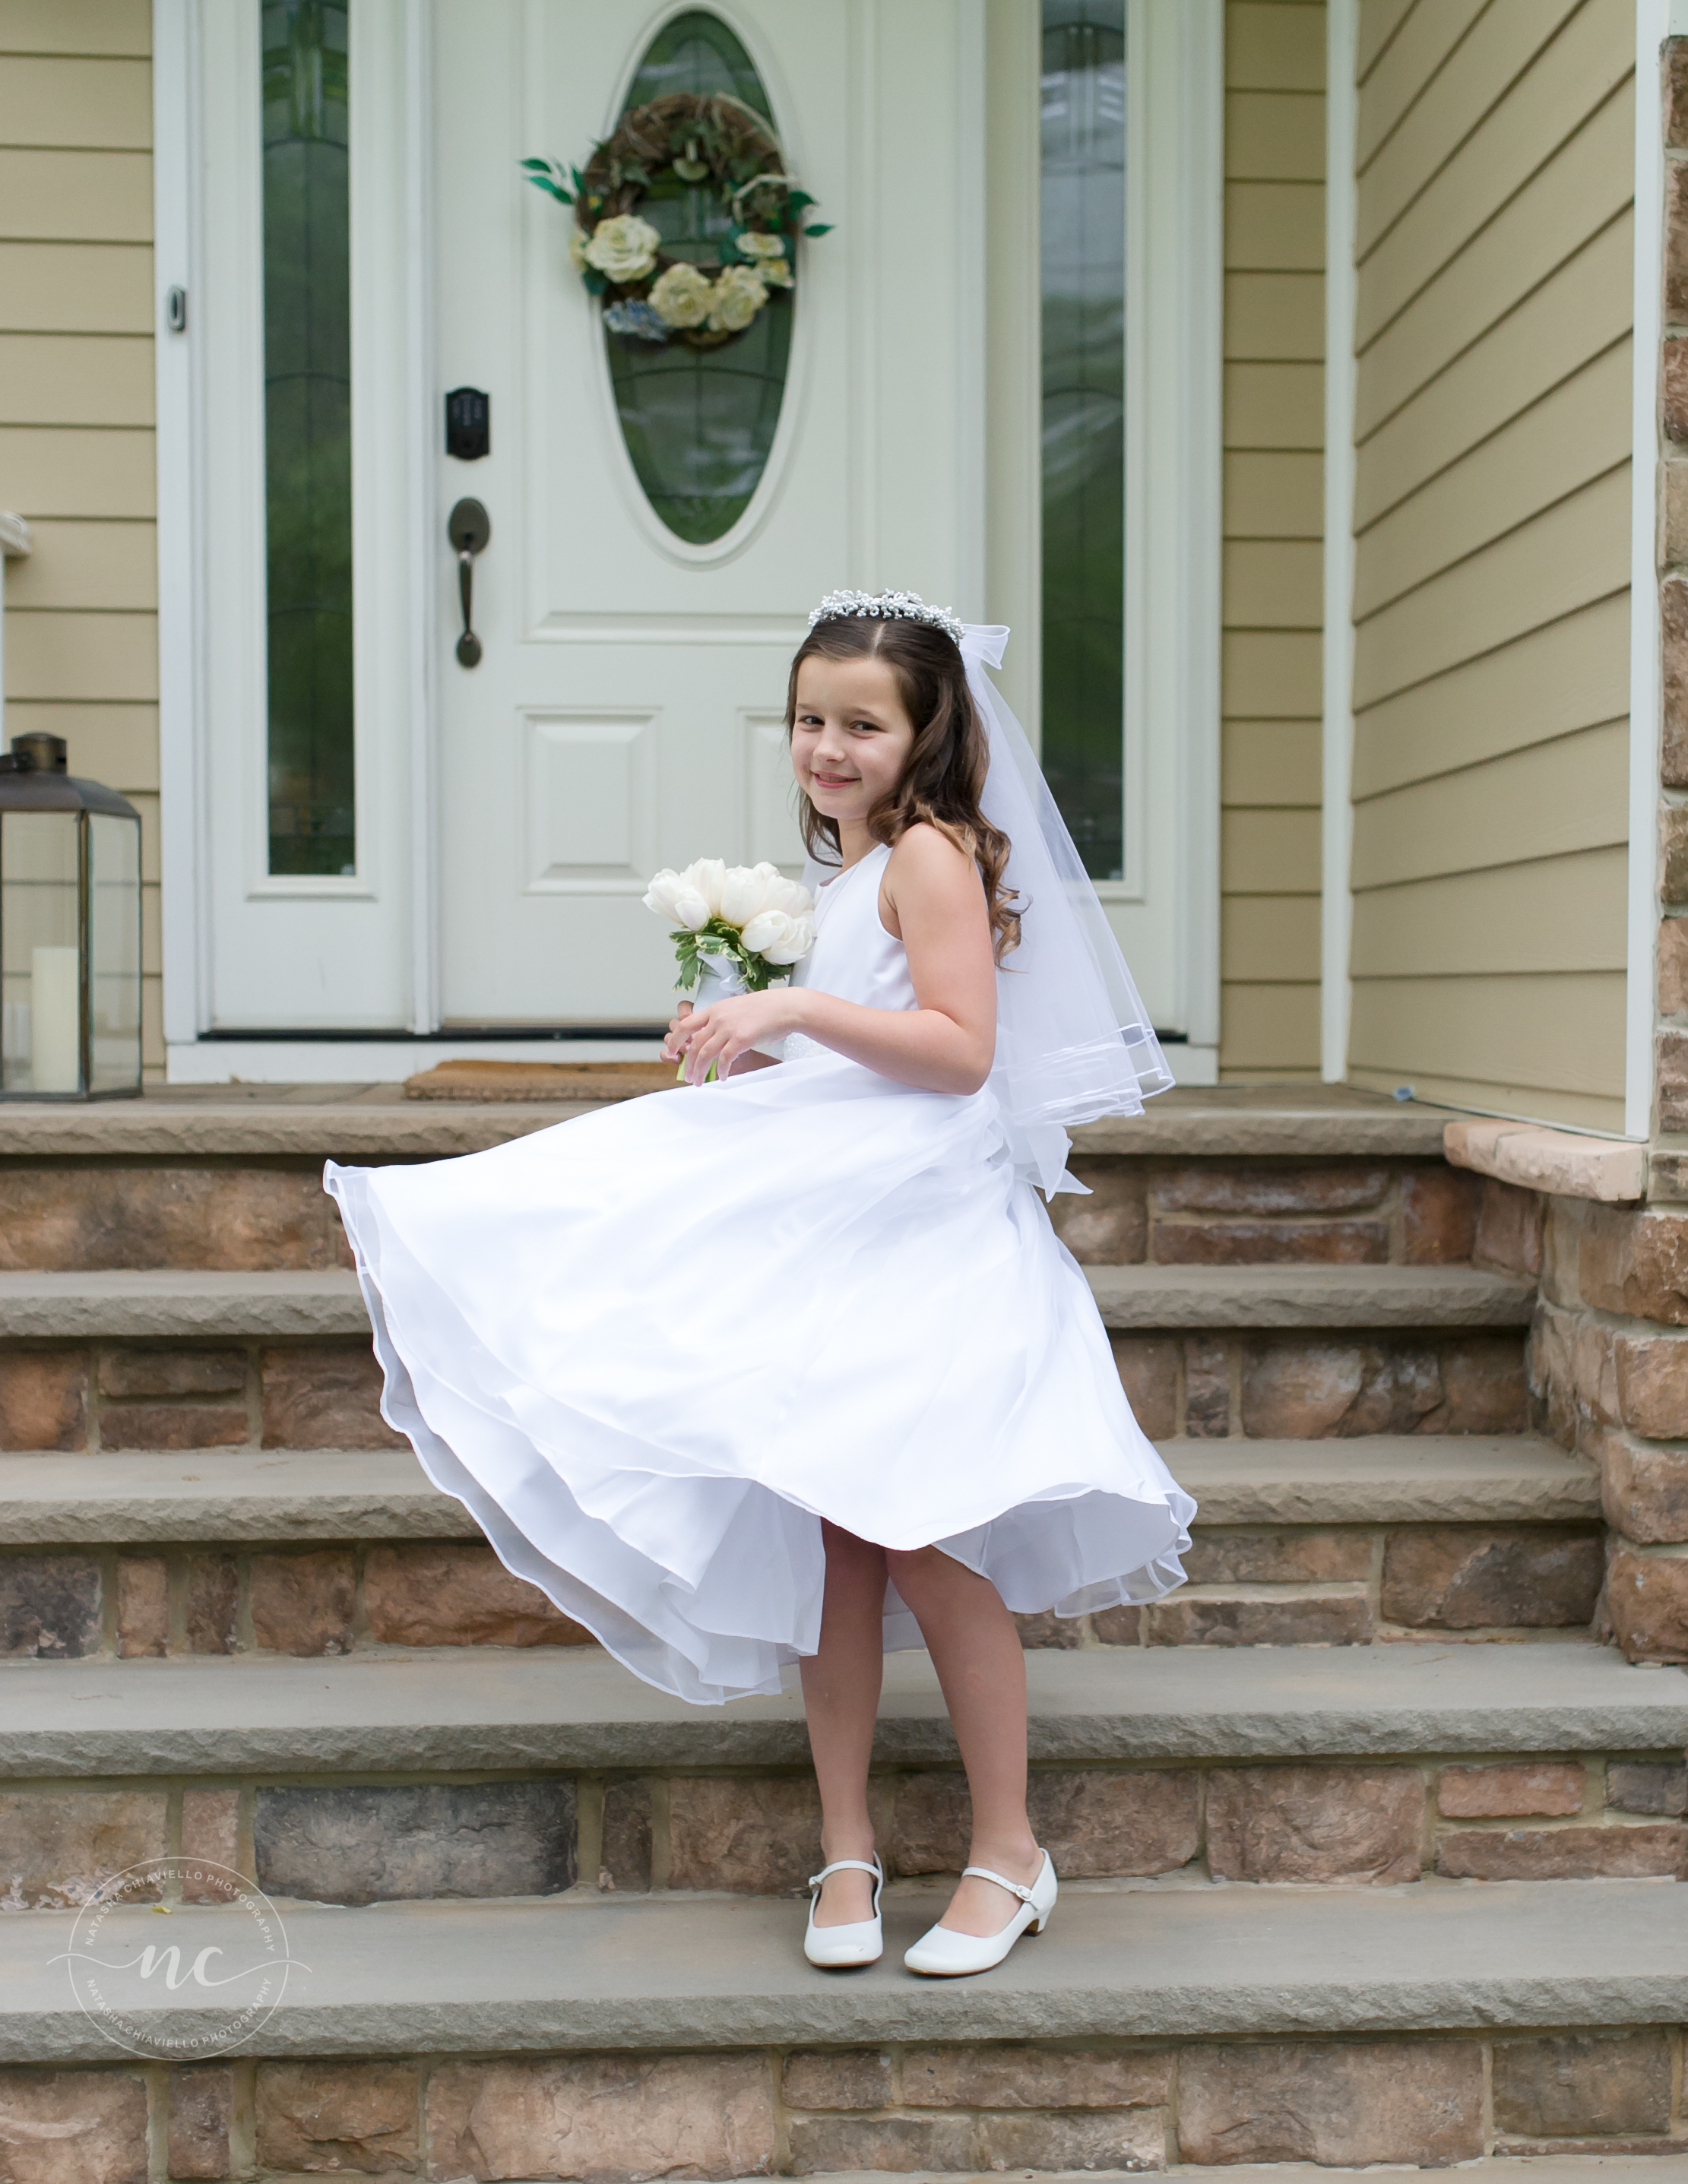 Communion Dress and Details